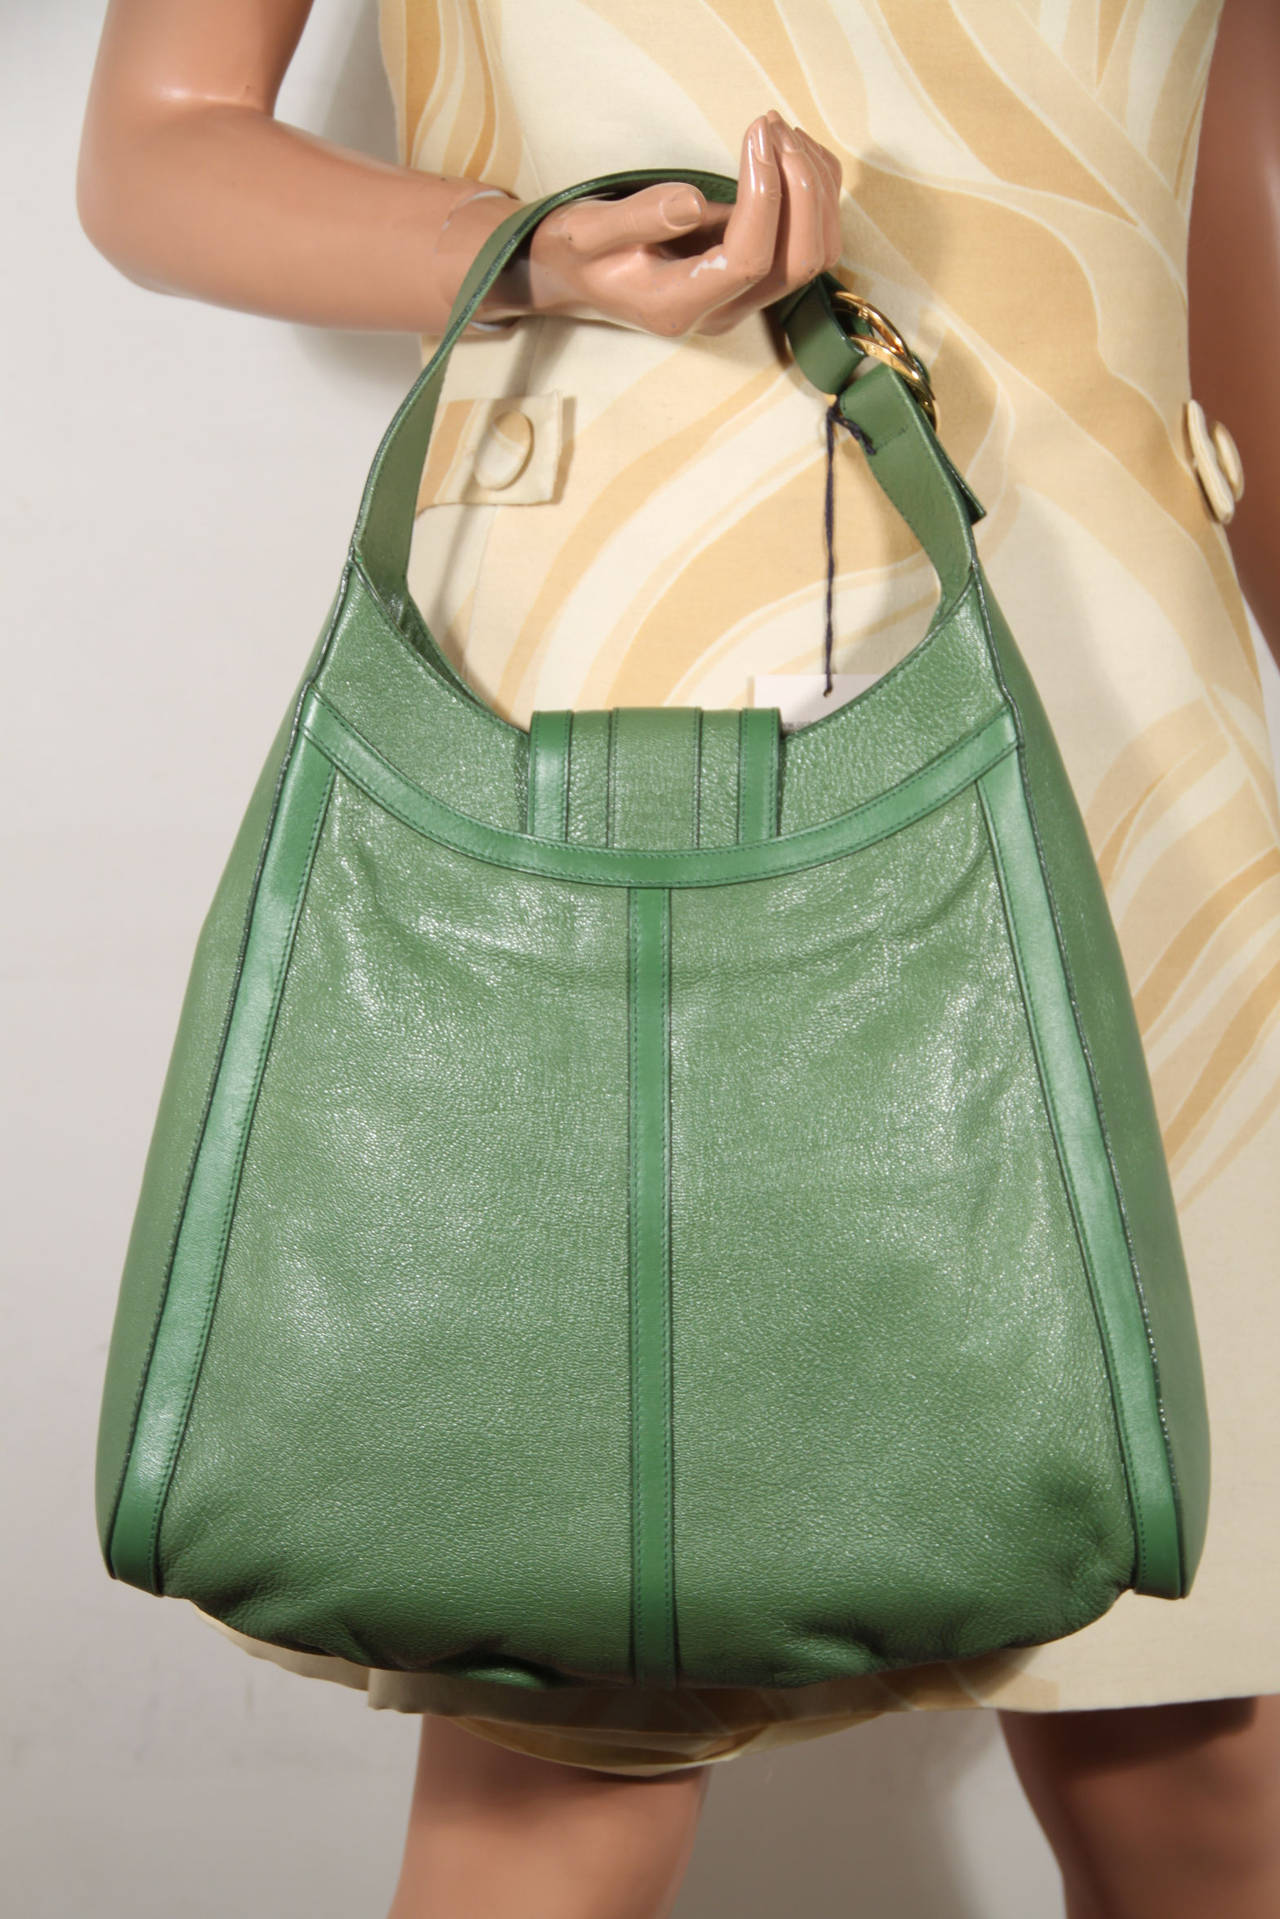 BULGARI BVLGARI Italian Authentic Green Leather CHANDRA BAG Shoulder Bag HOBO 3